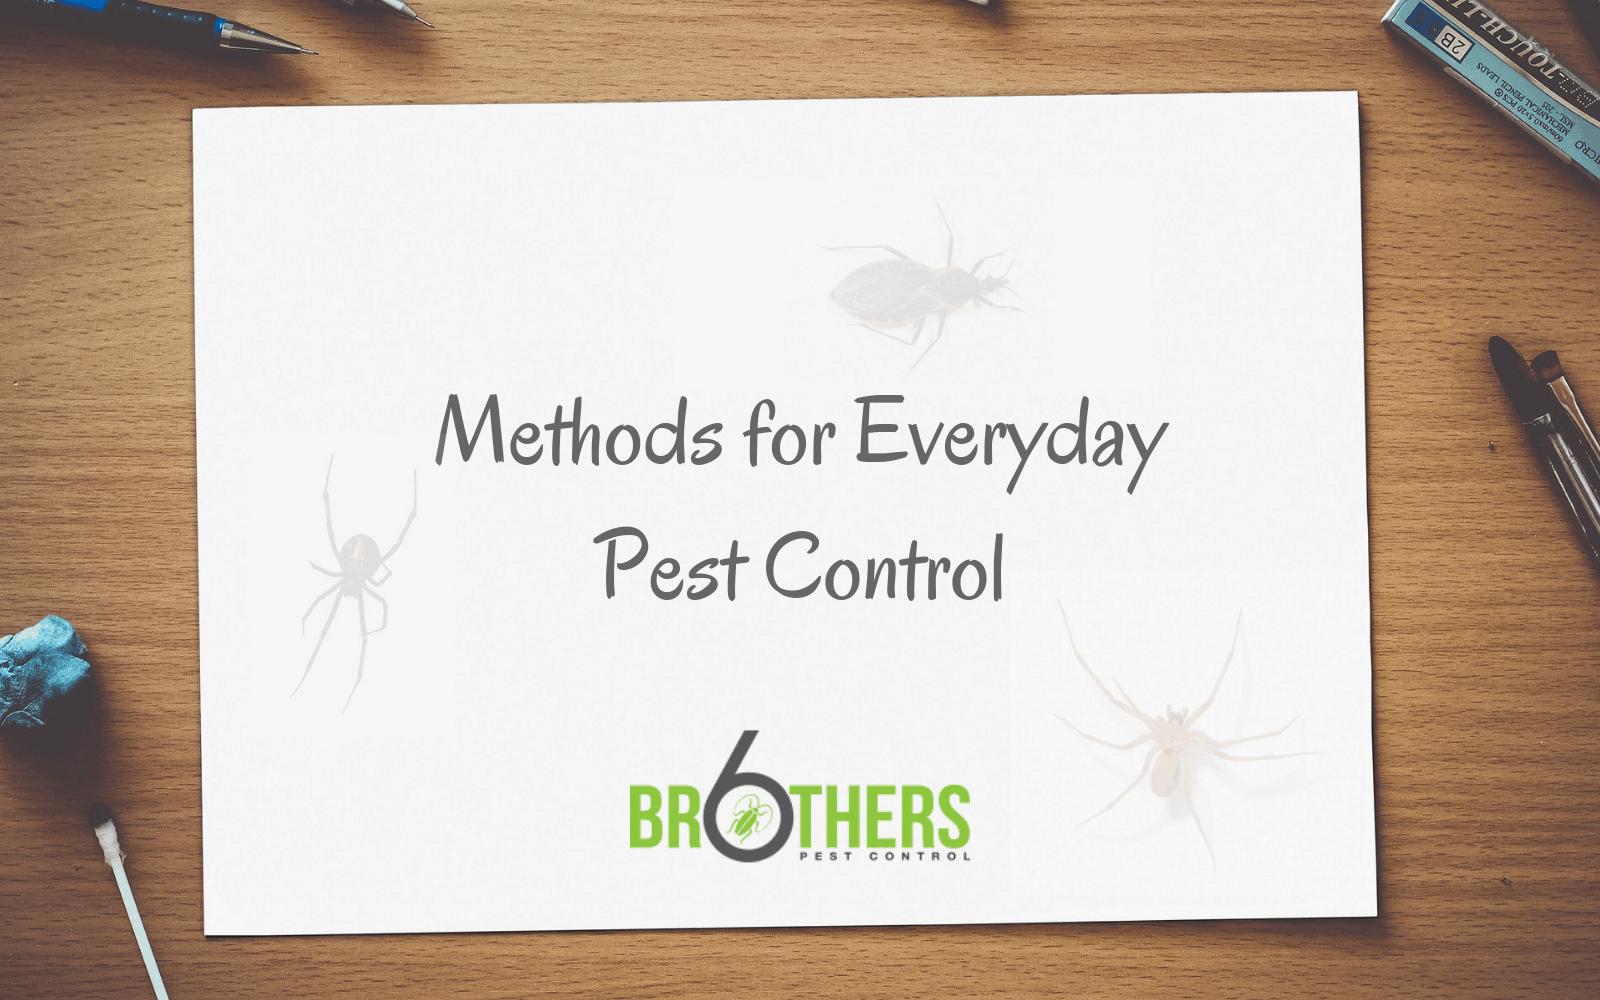 Methods of Everyday Pest Control